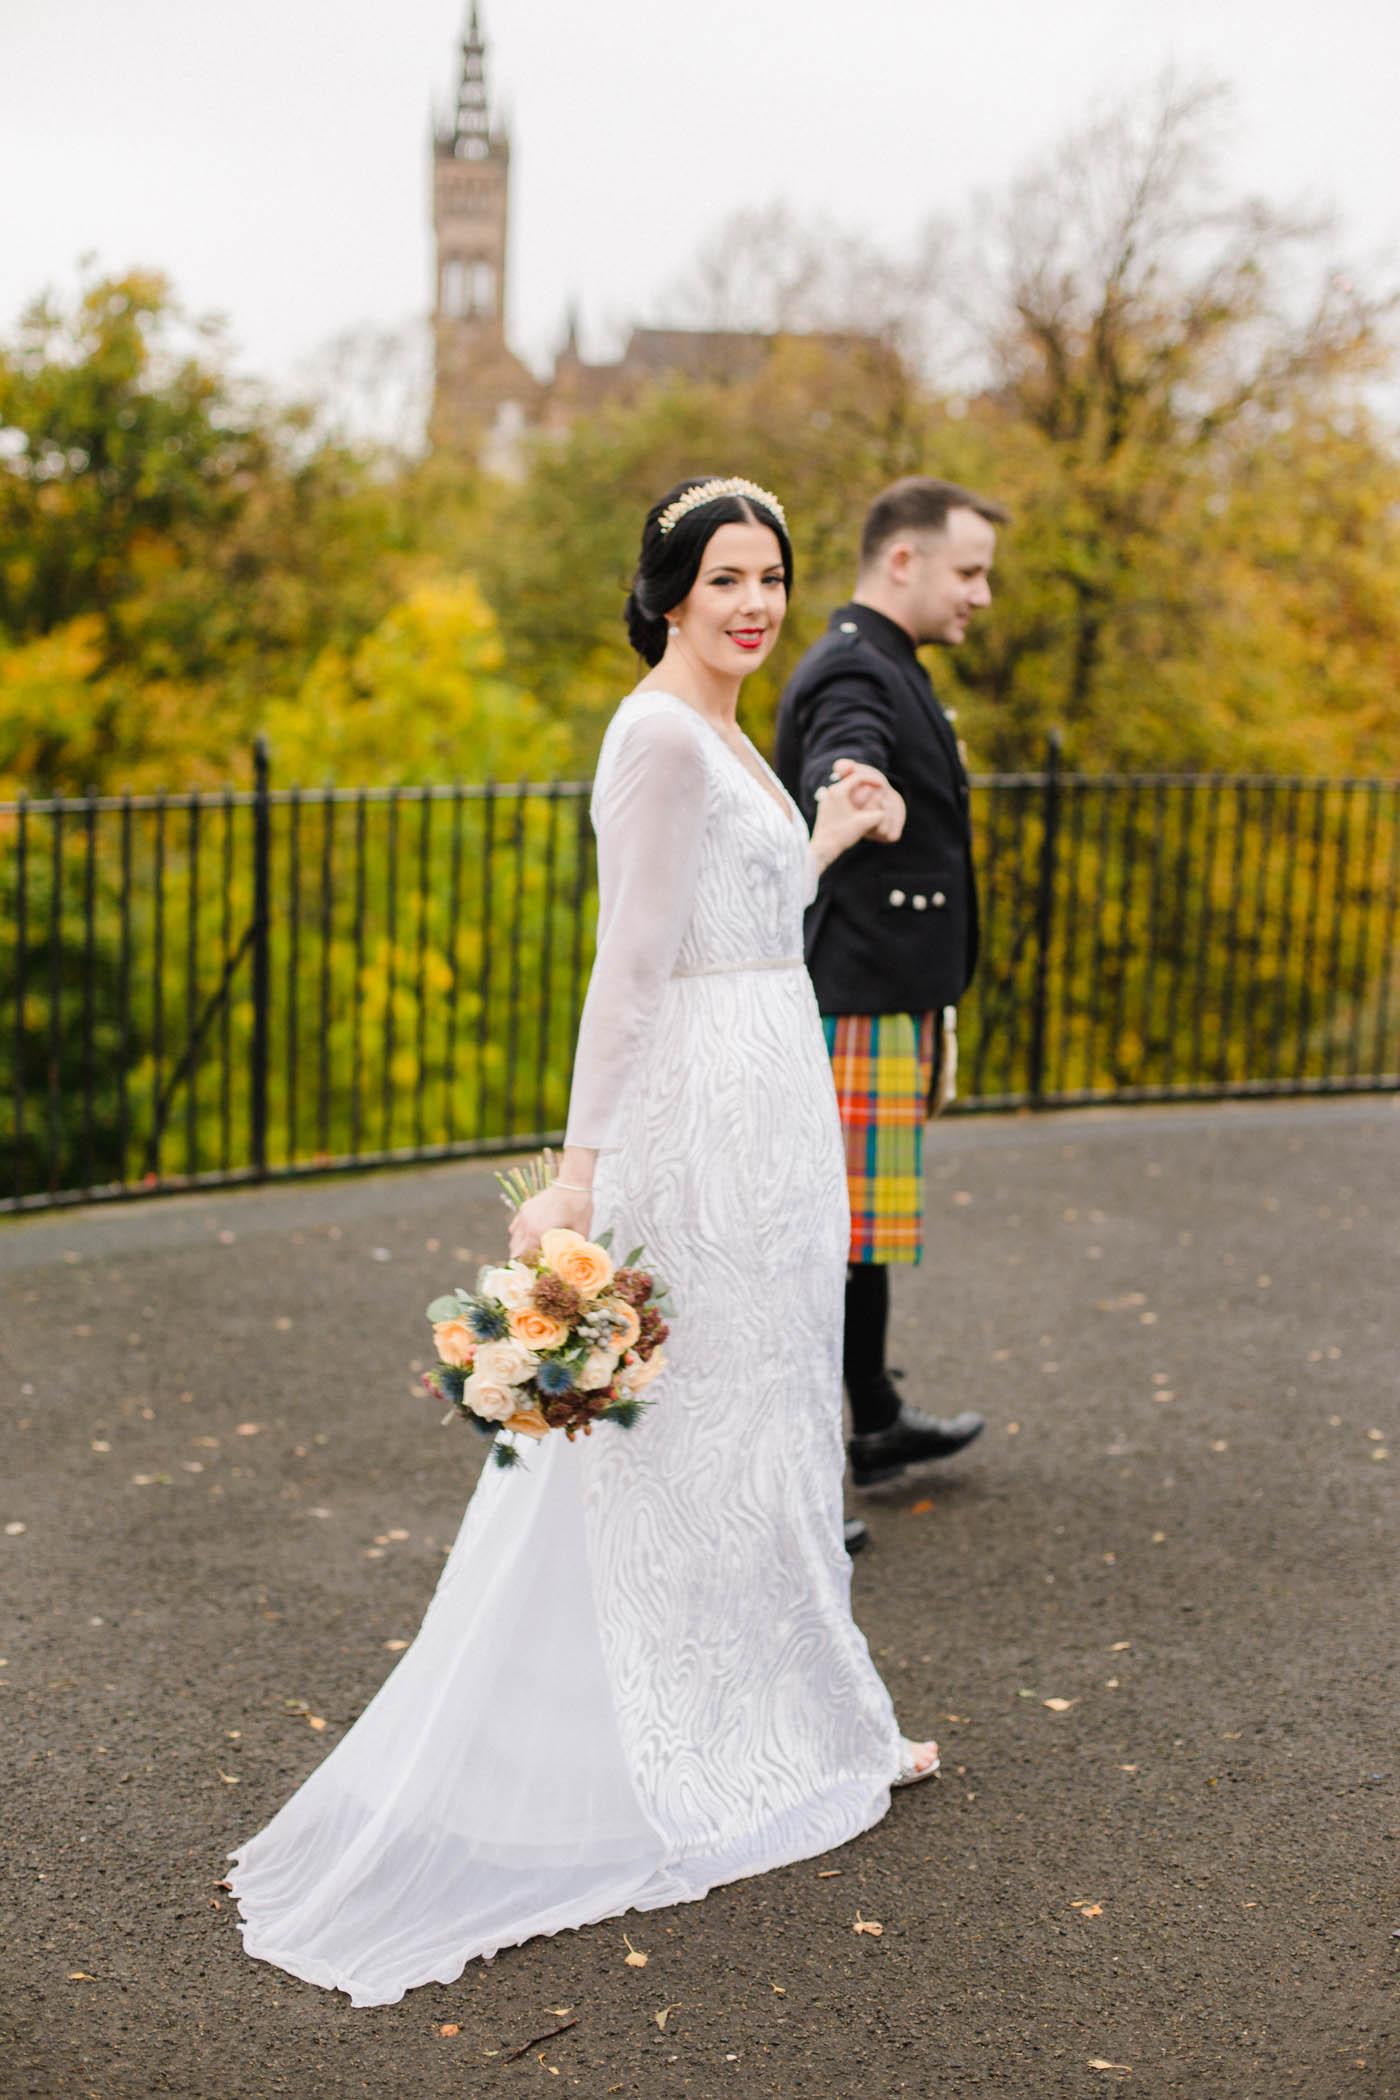 Kelvingrove Park wedding photography | Vintage Scottish wedding in yellow and thistle